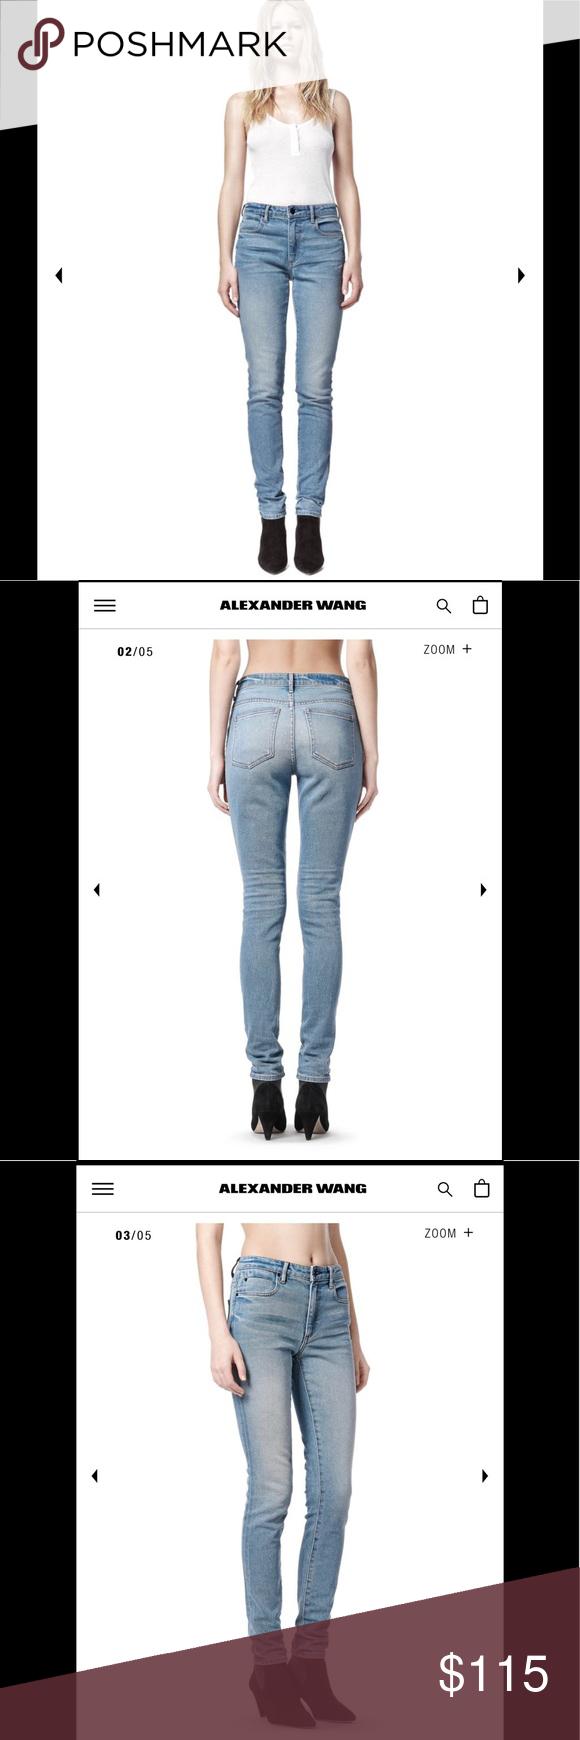 73199a806e Alexander Wang skinny jeans Wang 001 indigo fade AUTHENTIC WANG 001 SLIM  FIT HIGH RISE JEAN